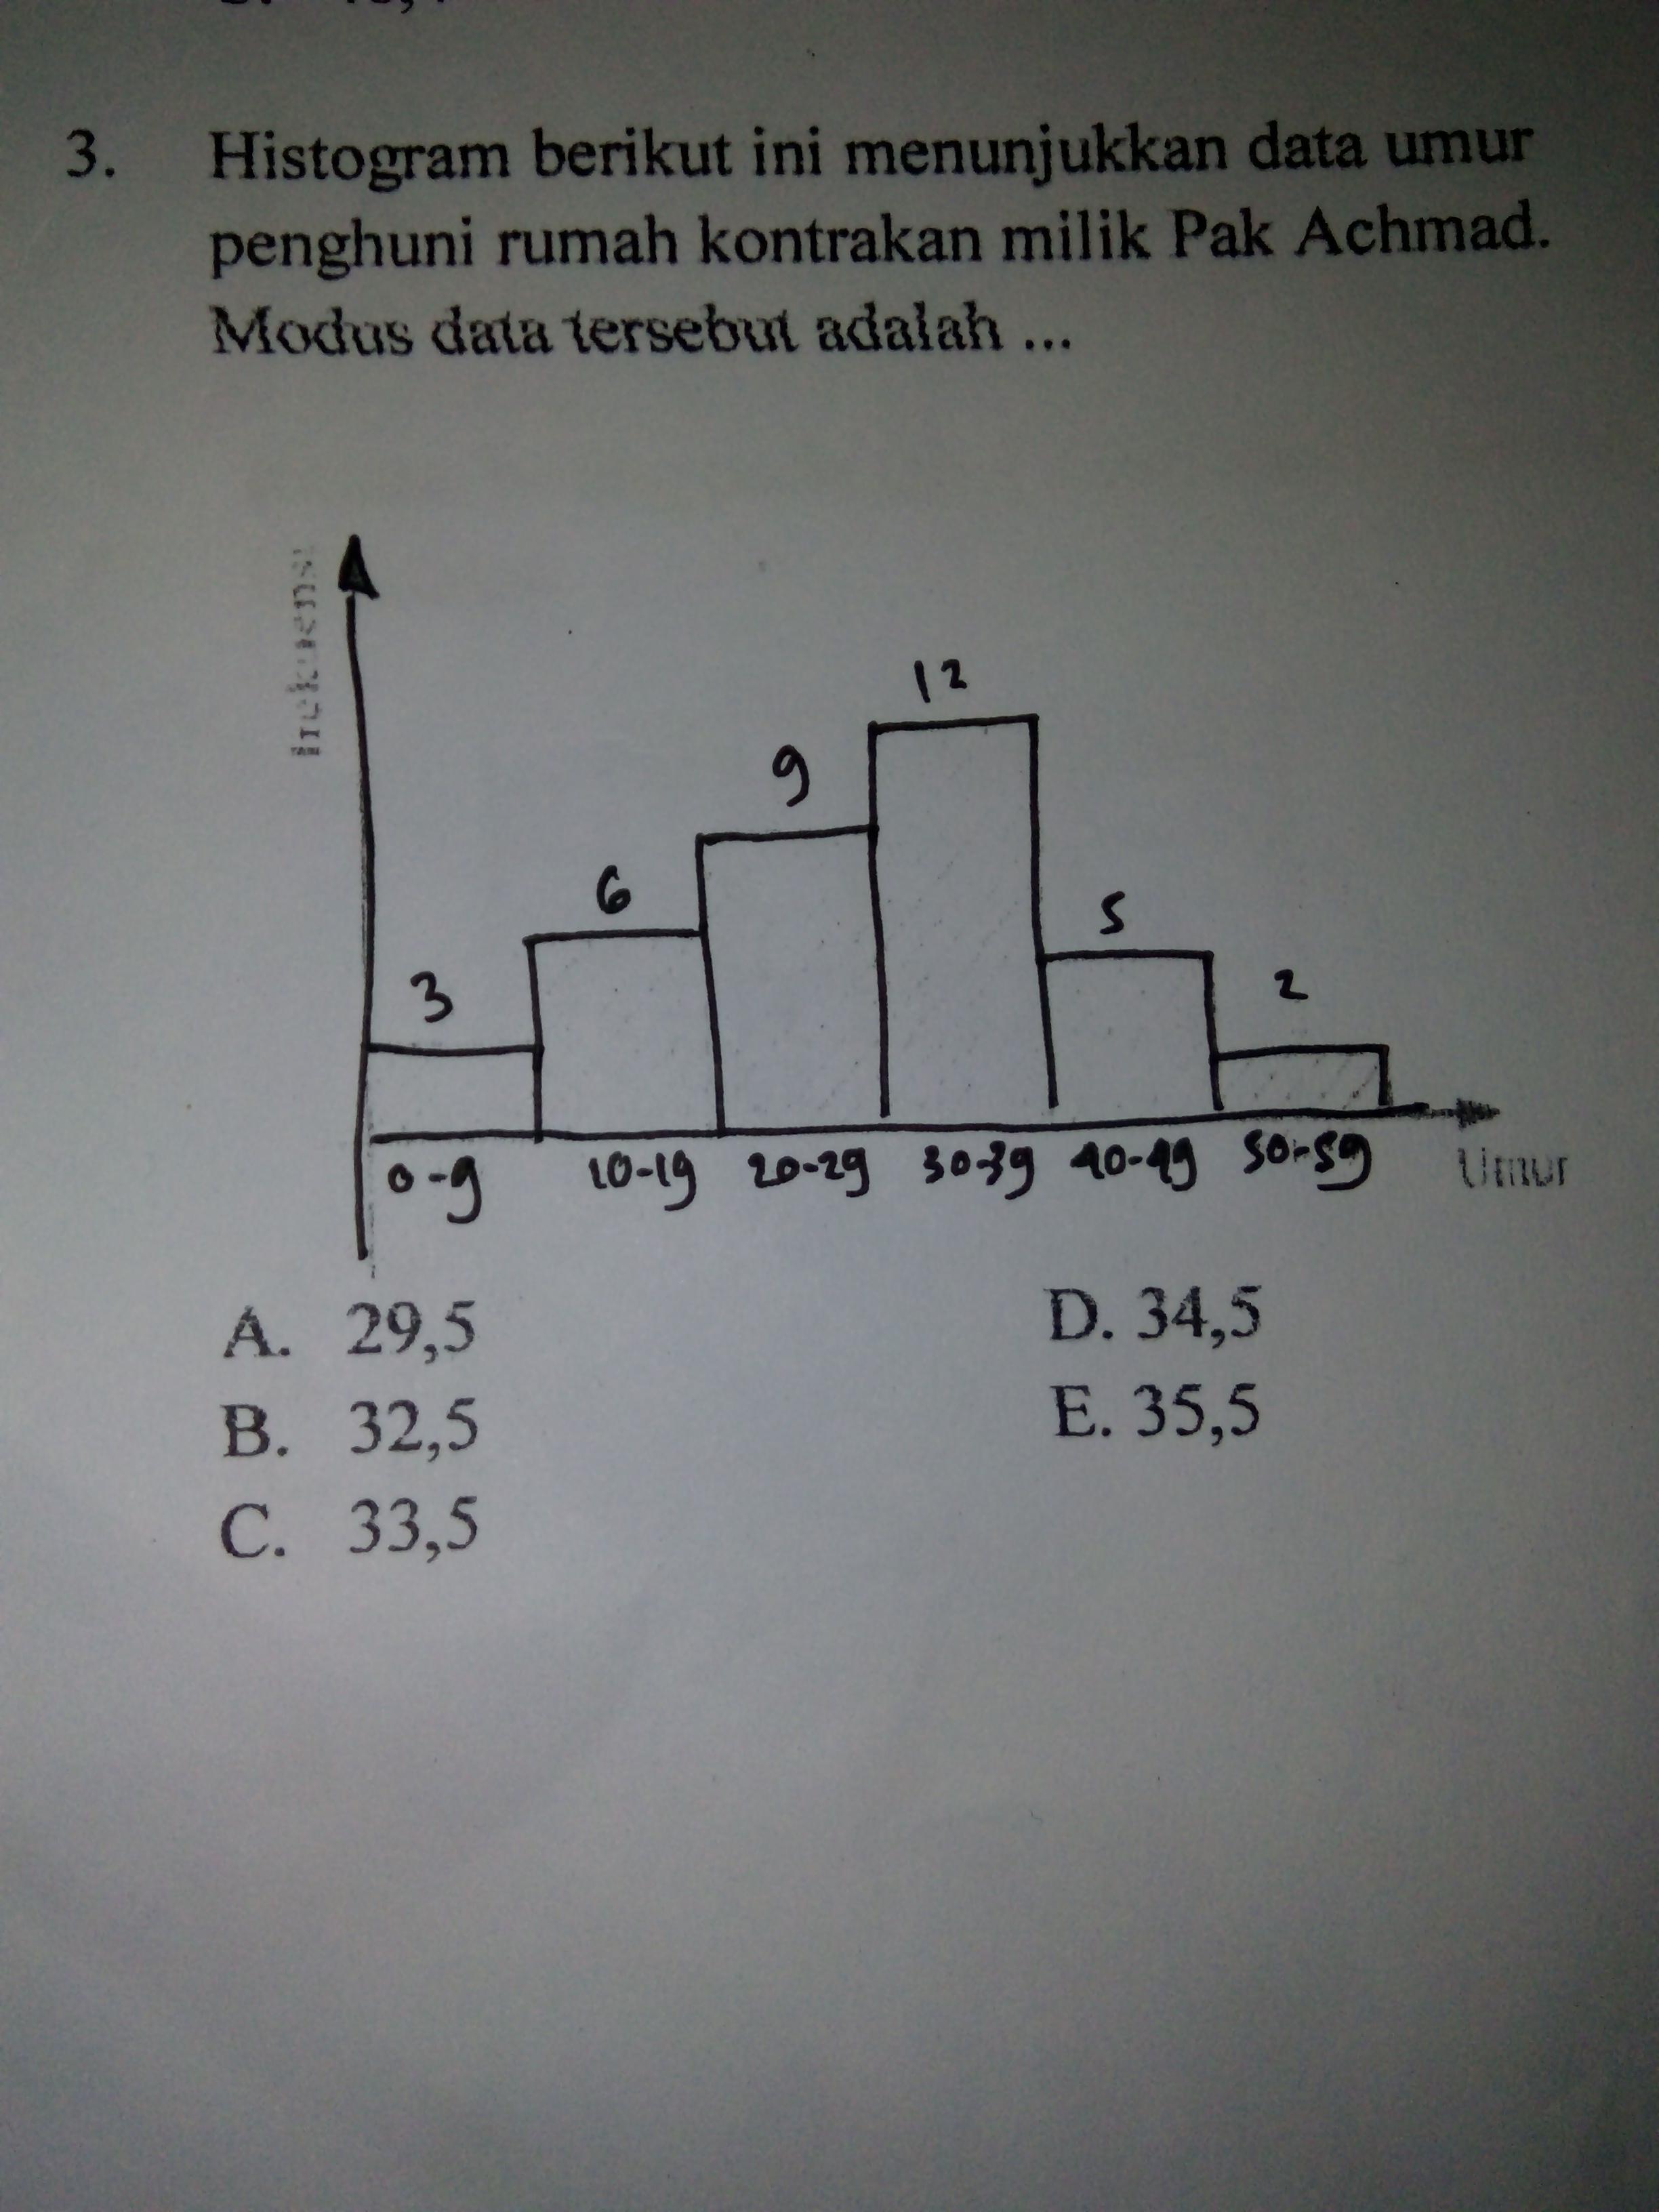 Modus Dari Histogram Berikut Adalah : modus, histogram, berikut, adalah, Modus, Histogram, Berikut, Brainly.co.id